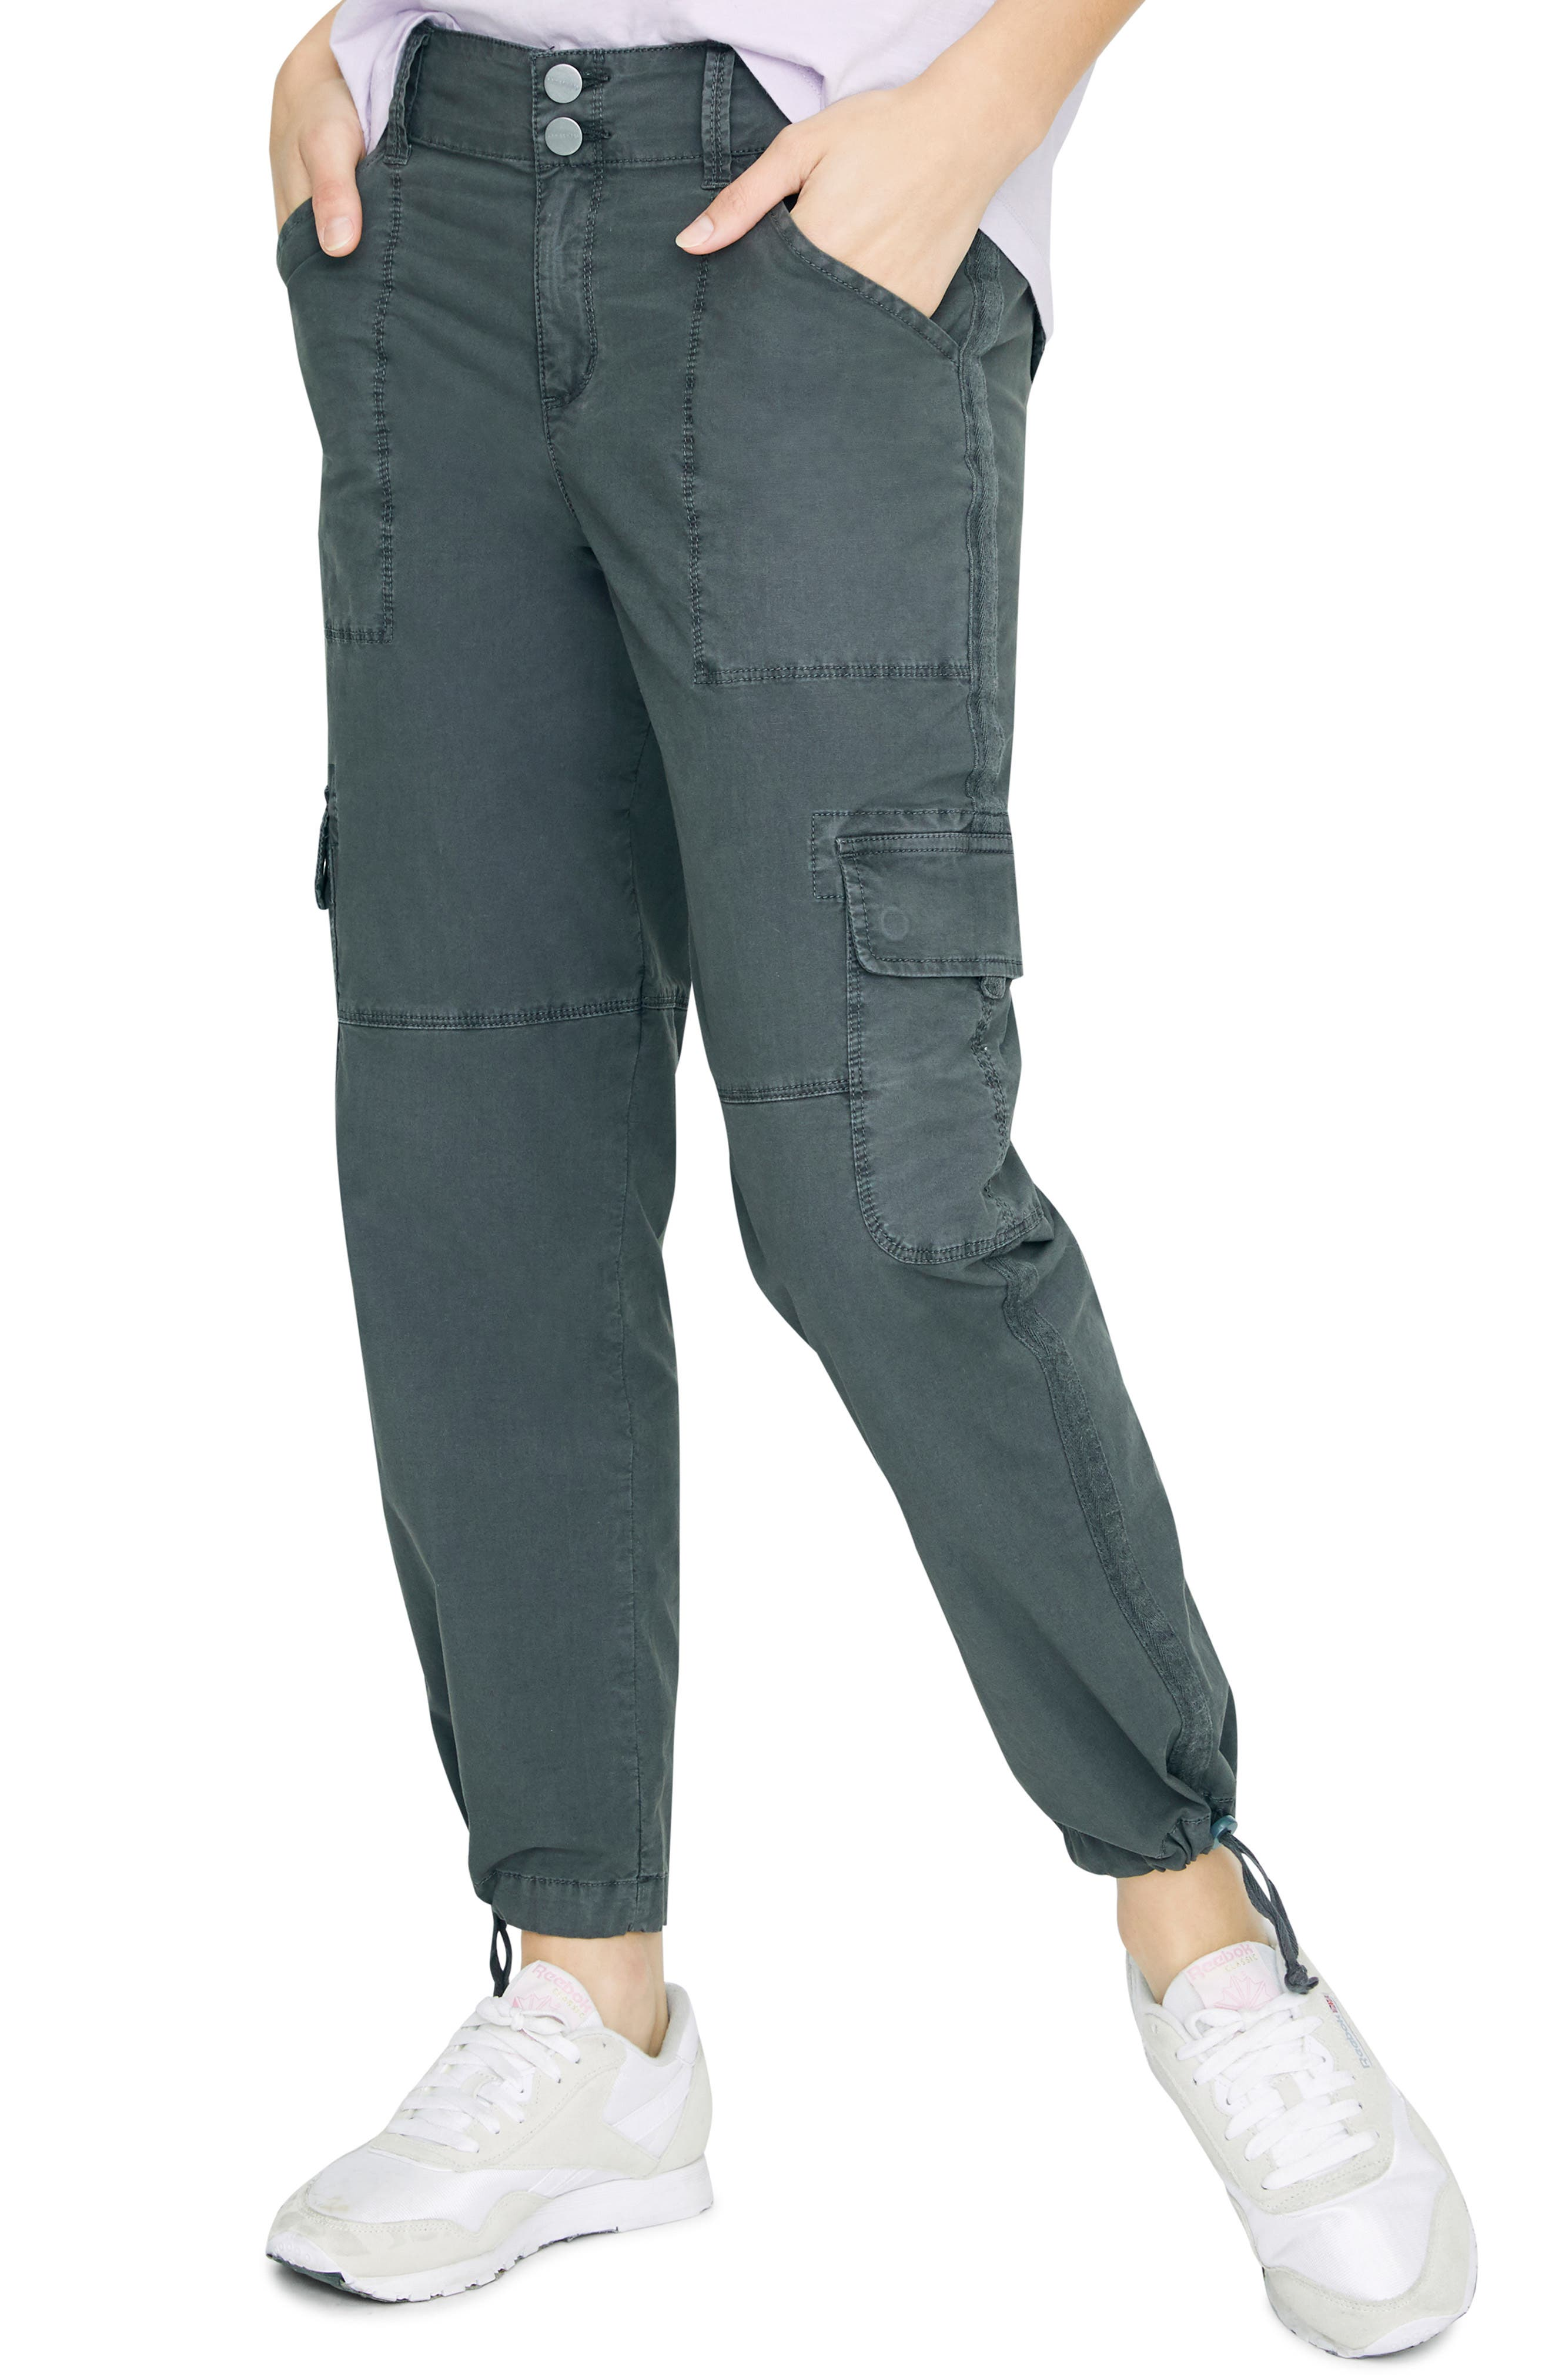 SANCTUARY, Terrain Crop Cargo Pants, Main thumbnail 1, color, WASHED FADED BLACK